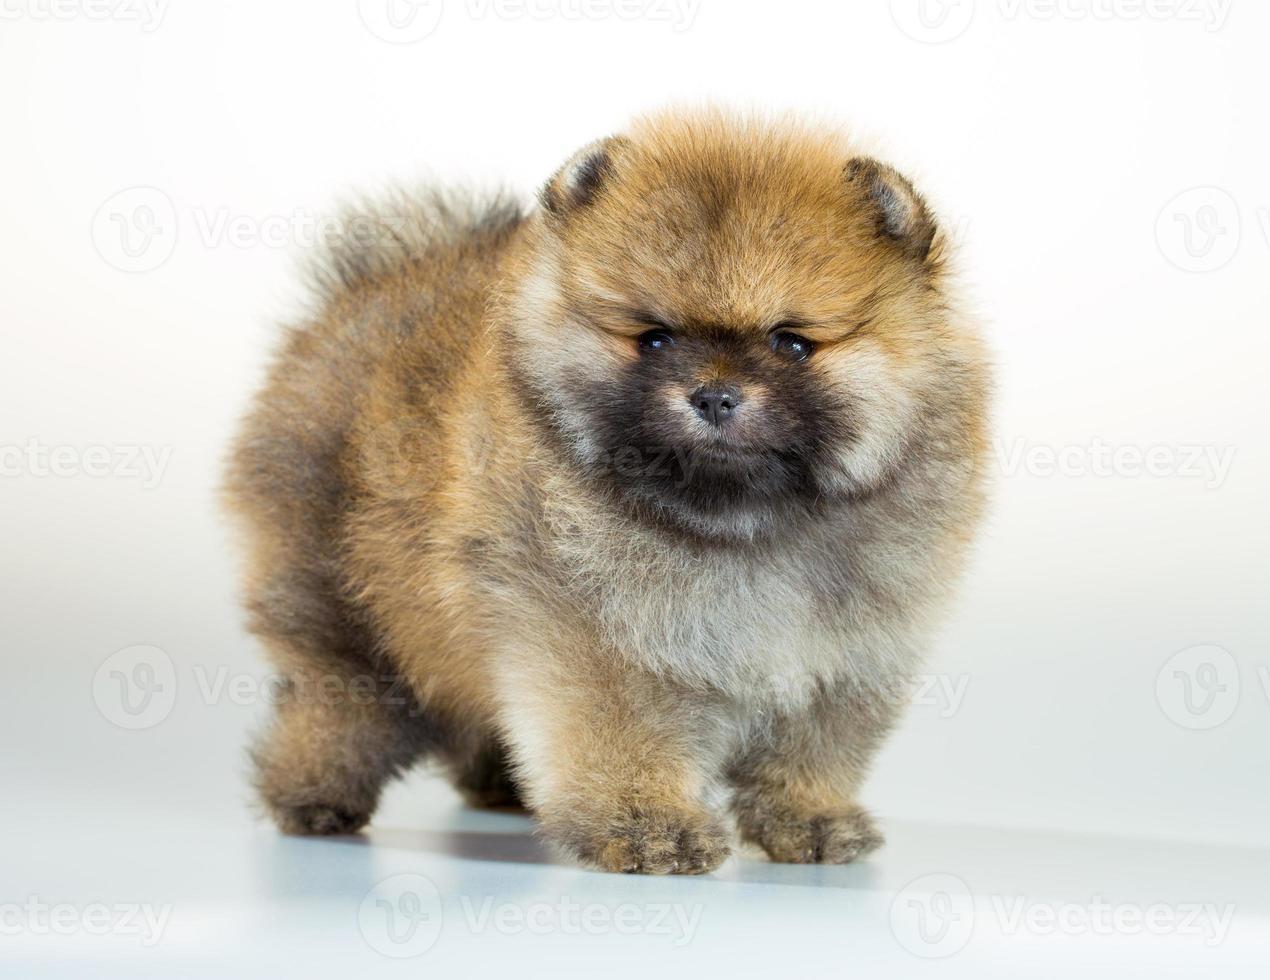 Pomerania cachorro sobre fondo blanco. foto